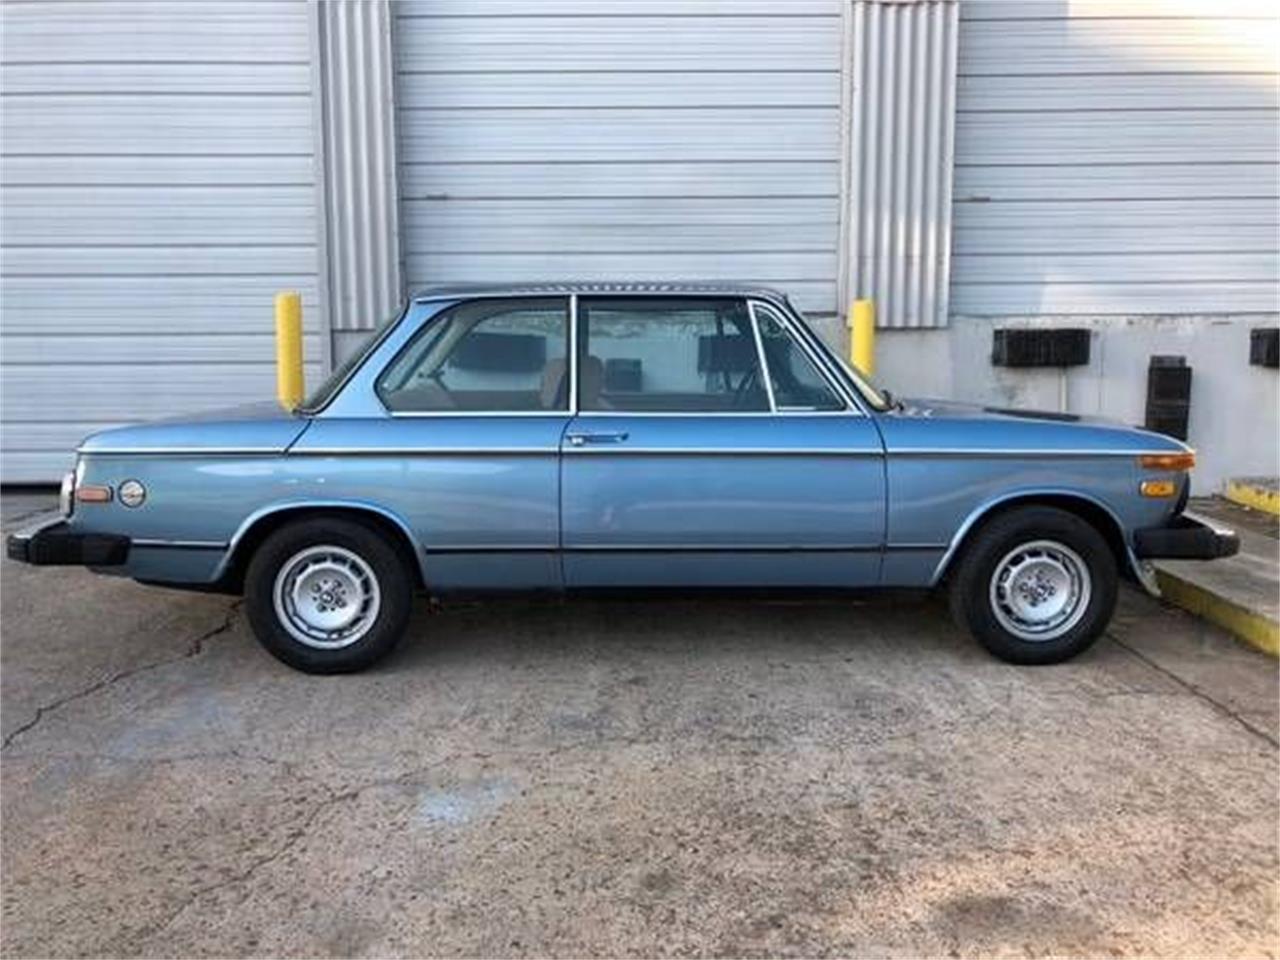 1975 Bmw 2002 For Sale Classiccarscom Cc 1127193